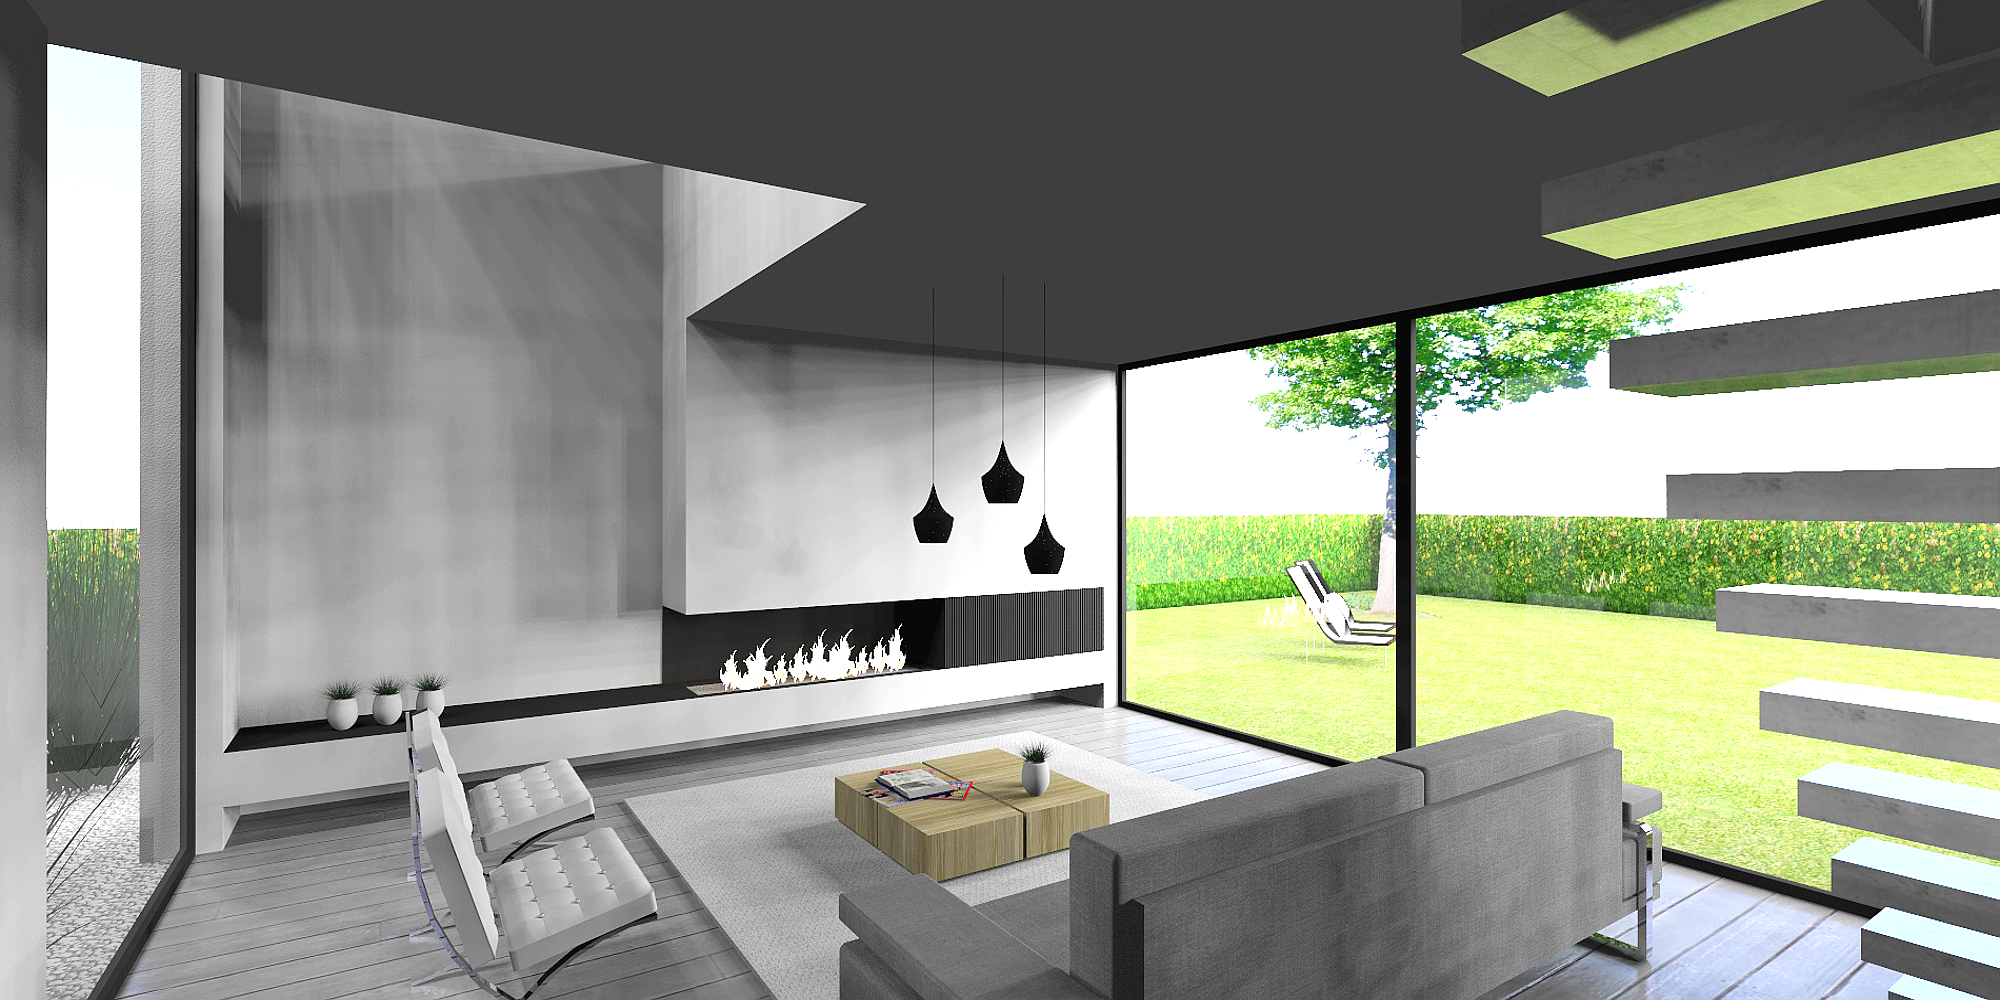 13_002_BM 3D beeld interieur 04.jpg